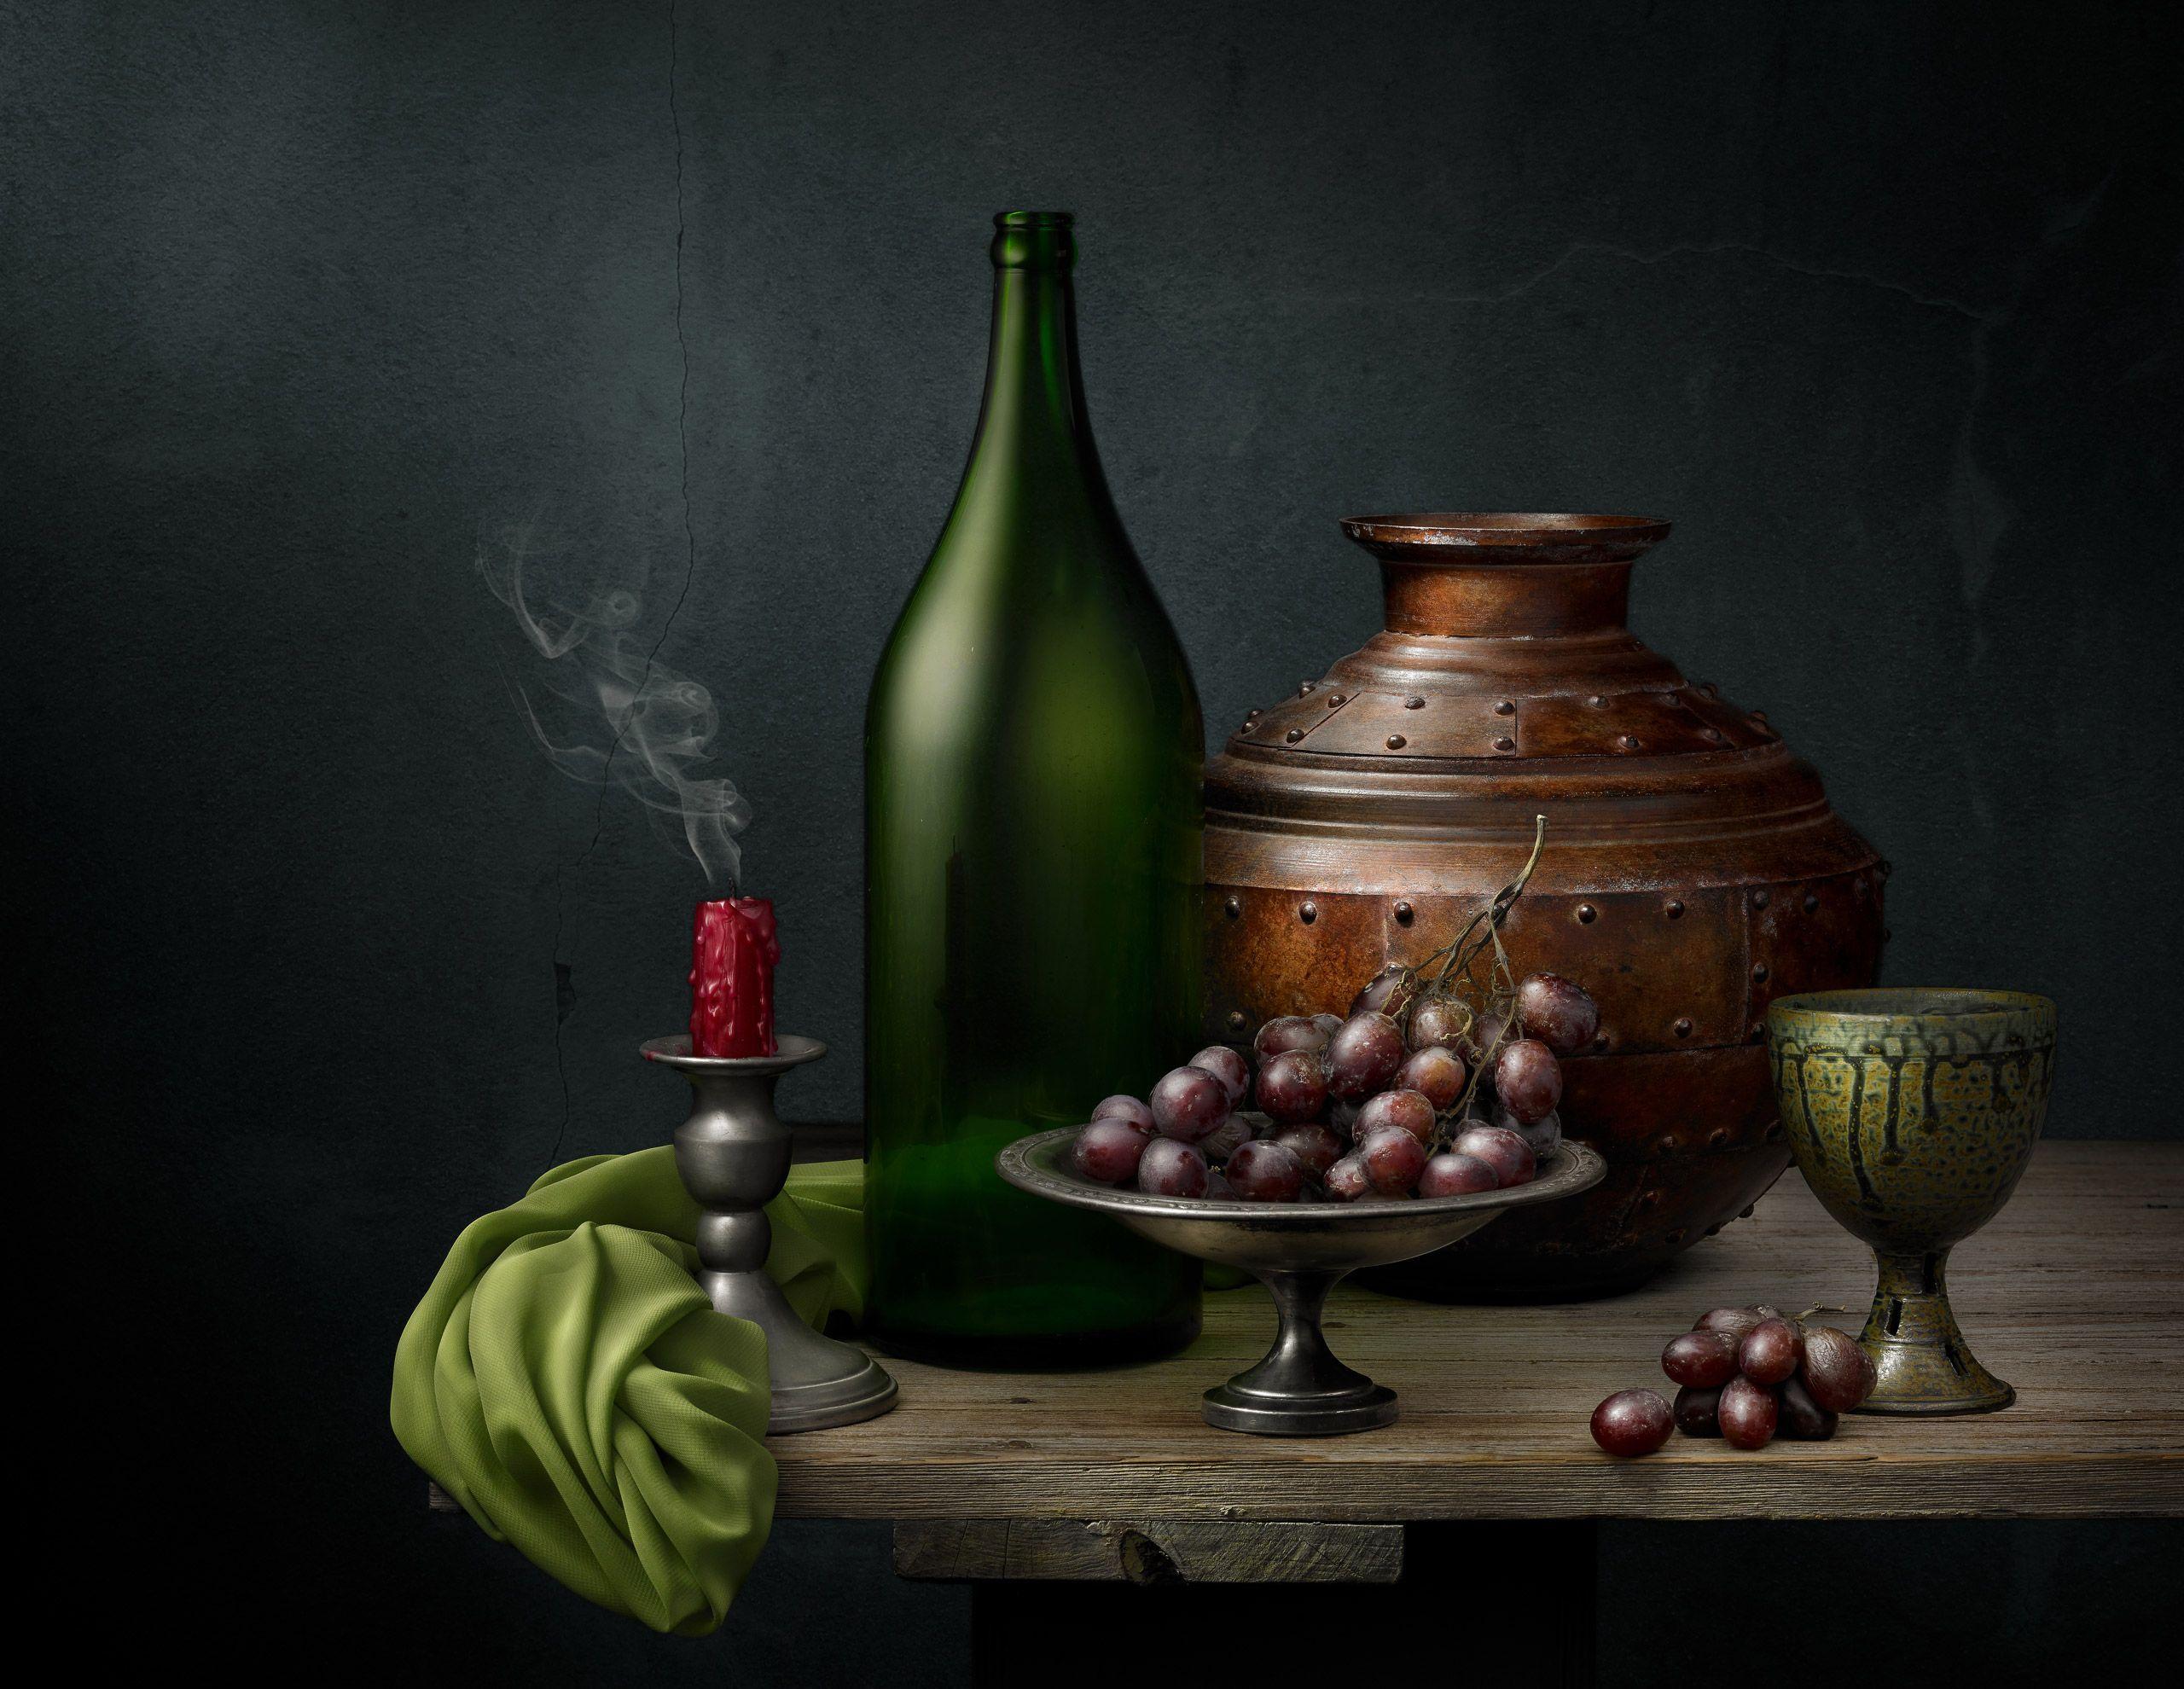 Pin by Sara Ghedina on fine art still life | Fine art ...